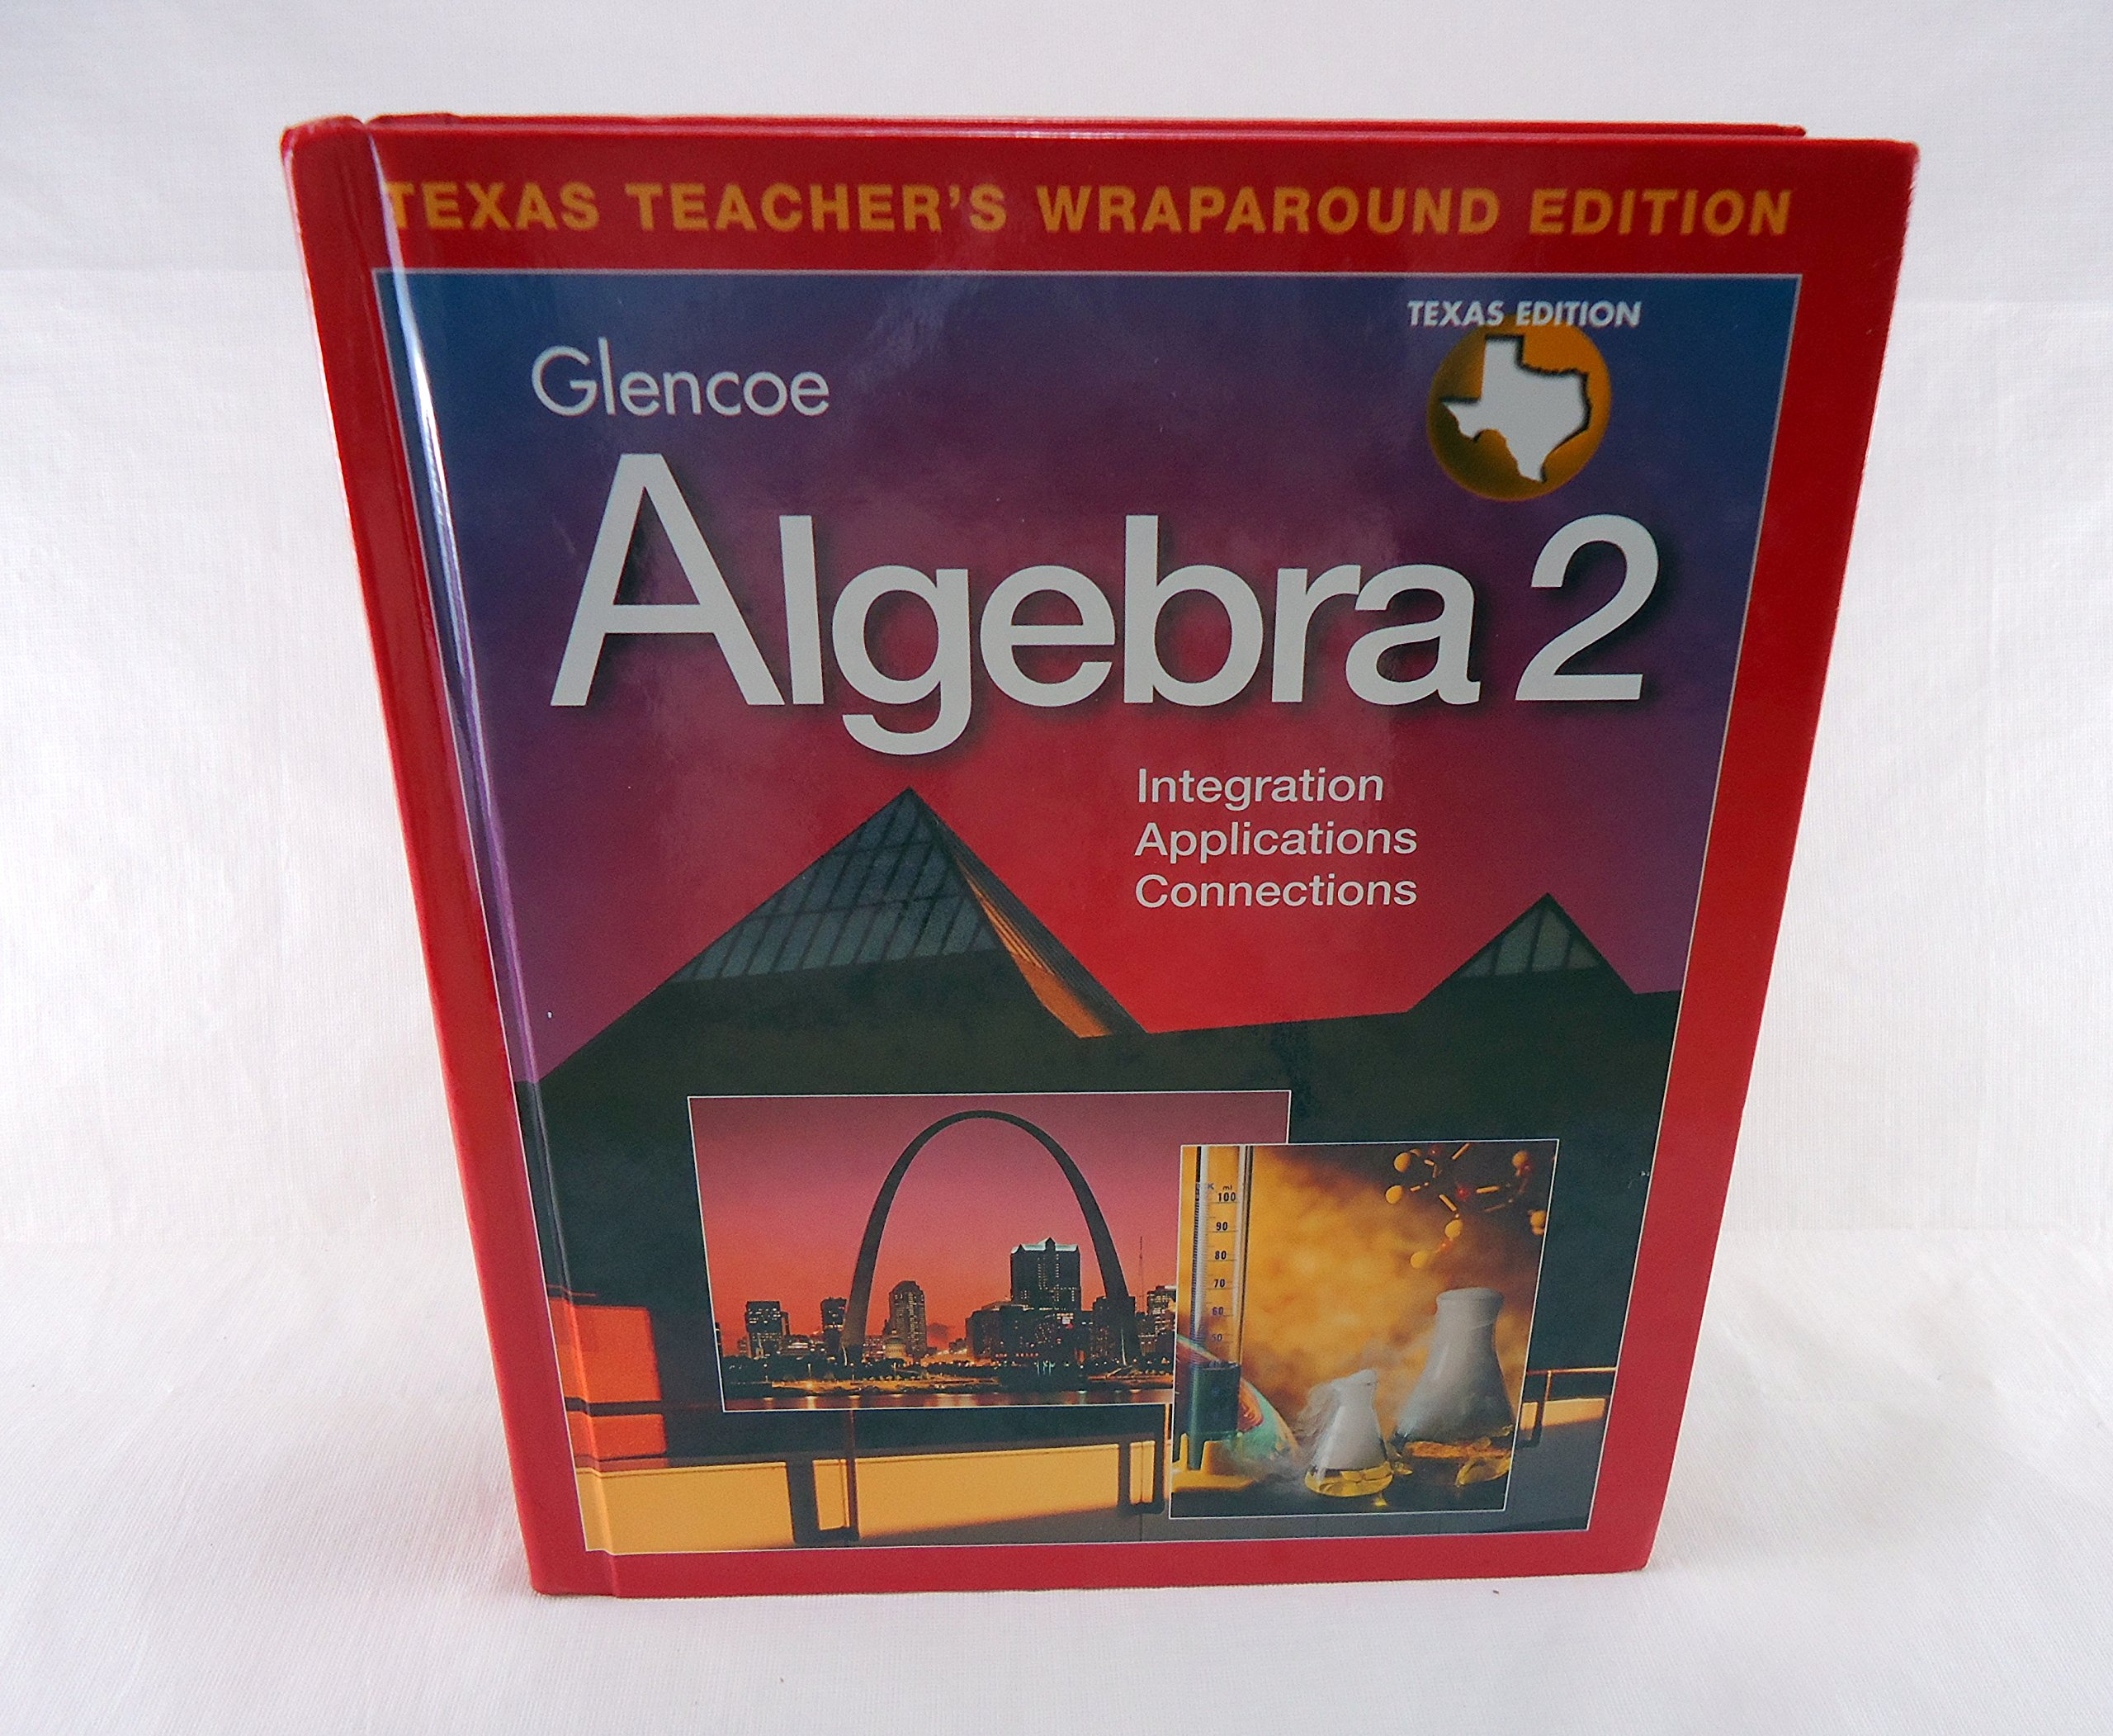 Glencoe algebra 2 integration applications connections texas glencoe algebra 2 integration applications connections texas teachers wraparound edition cindy j boyd william collins 9780028251820 amazon fandeluxe Choice Image